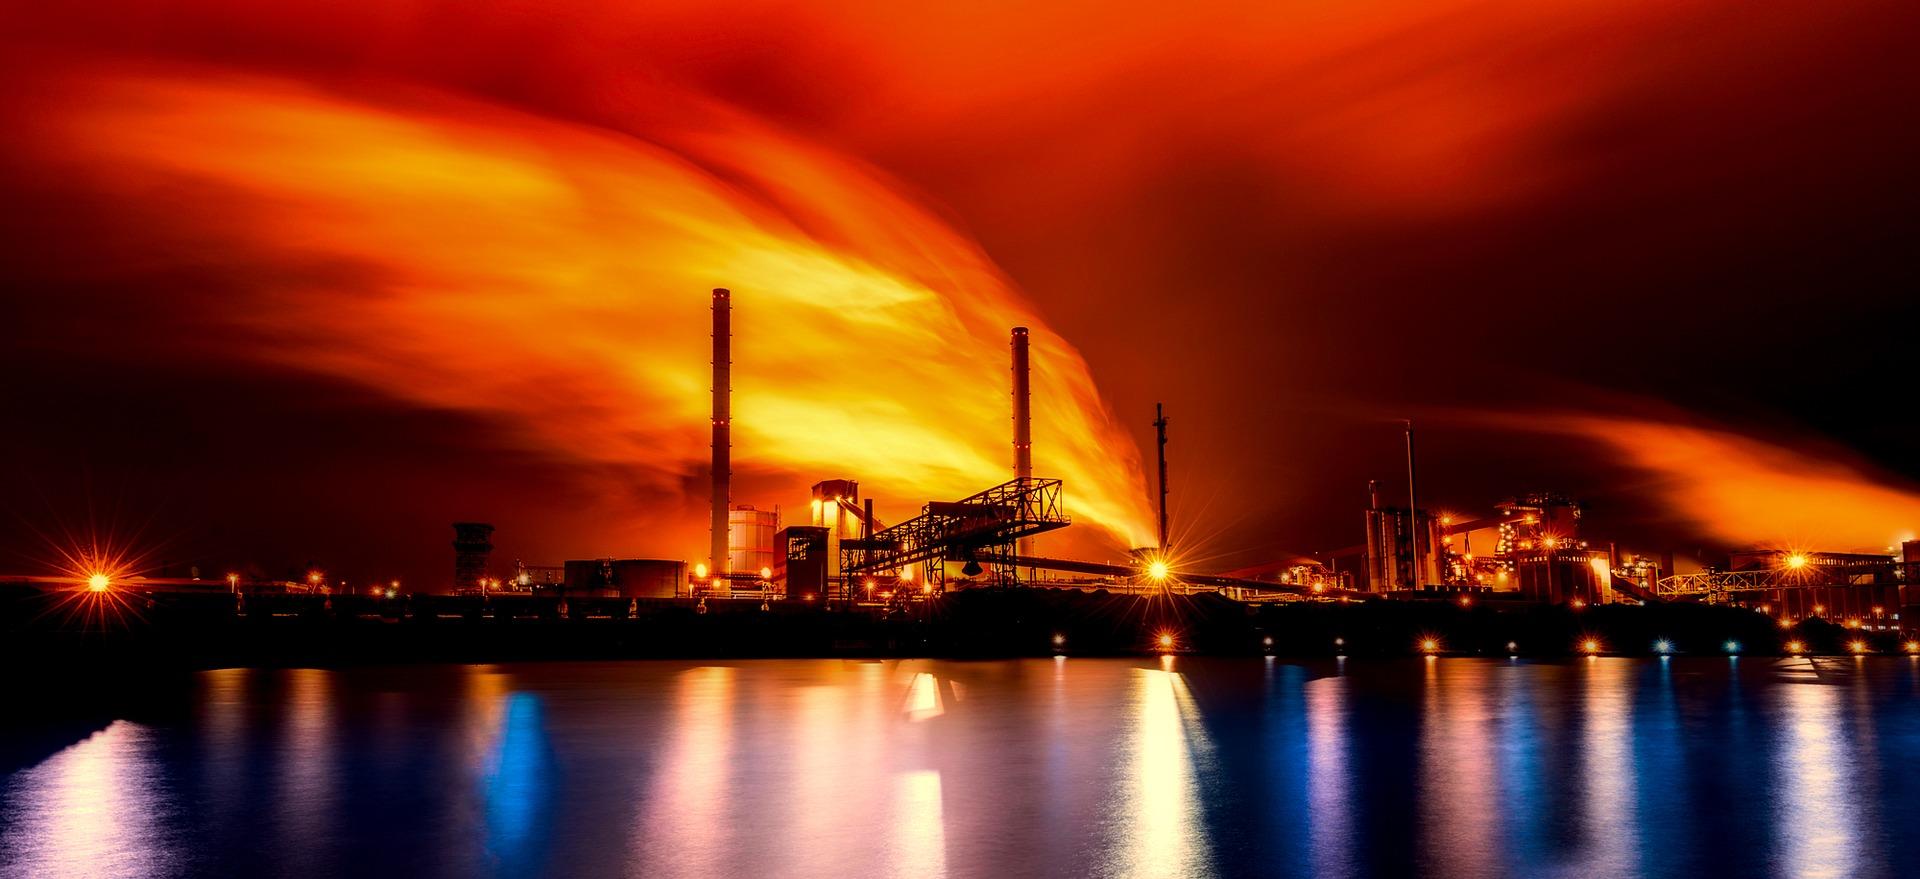 Oil leaders at Davos debate tougher CO₂ cuts as pressure mounts